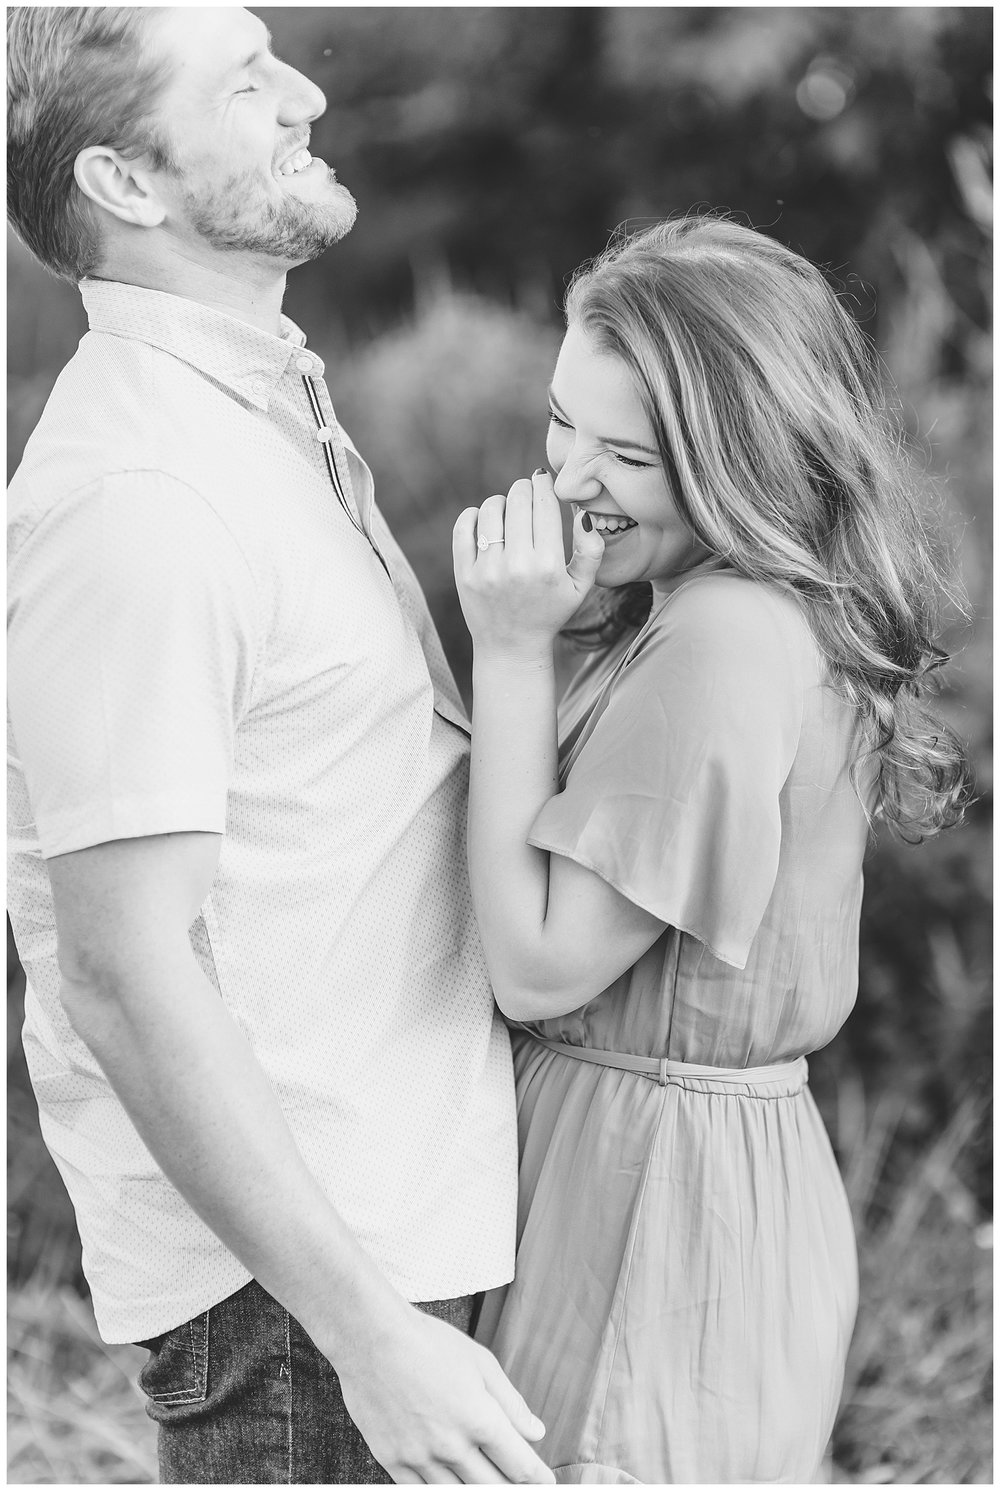 everleigh-photography-cincinnati-wedding-photographer-kentucky-wedding-photographer-13